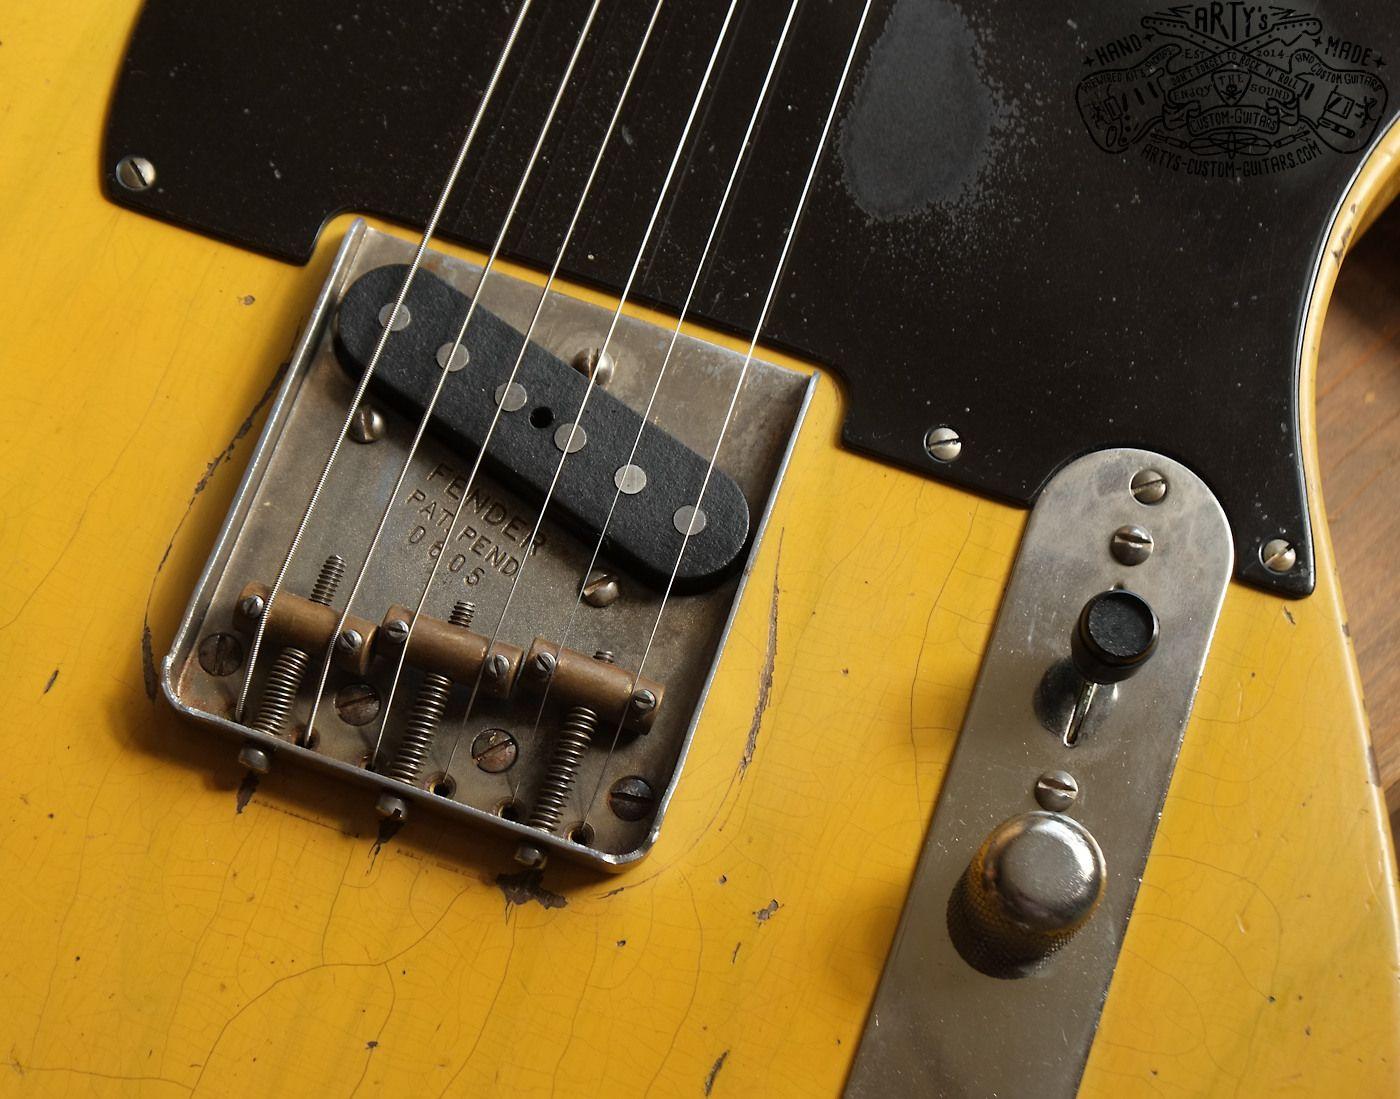 Blackguard Telecaster 1950 Arty S Relic Repro Broadcaster Nocaster Blackguard Tele Www Artys Custom Guitars Com Fender Vintage Telecaster Relic